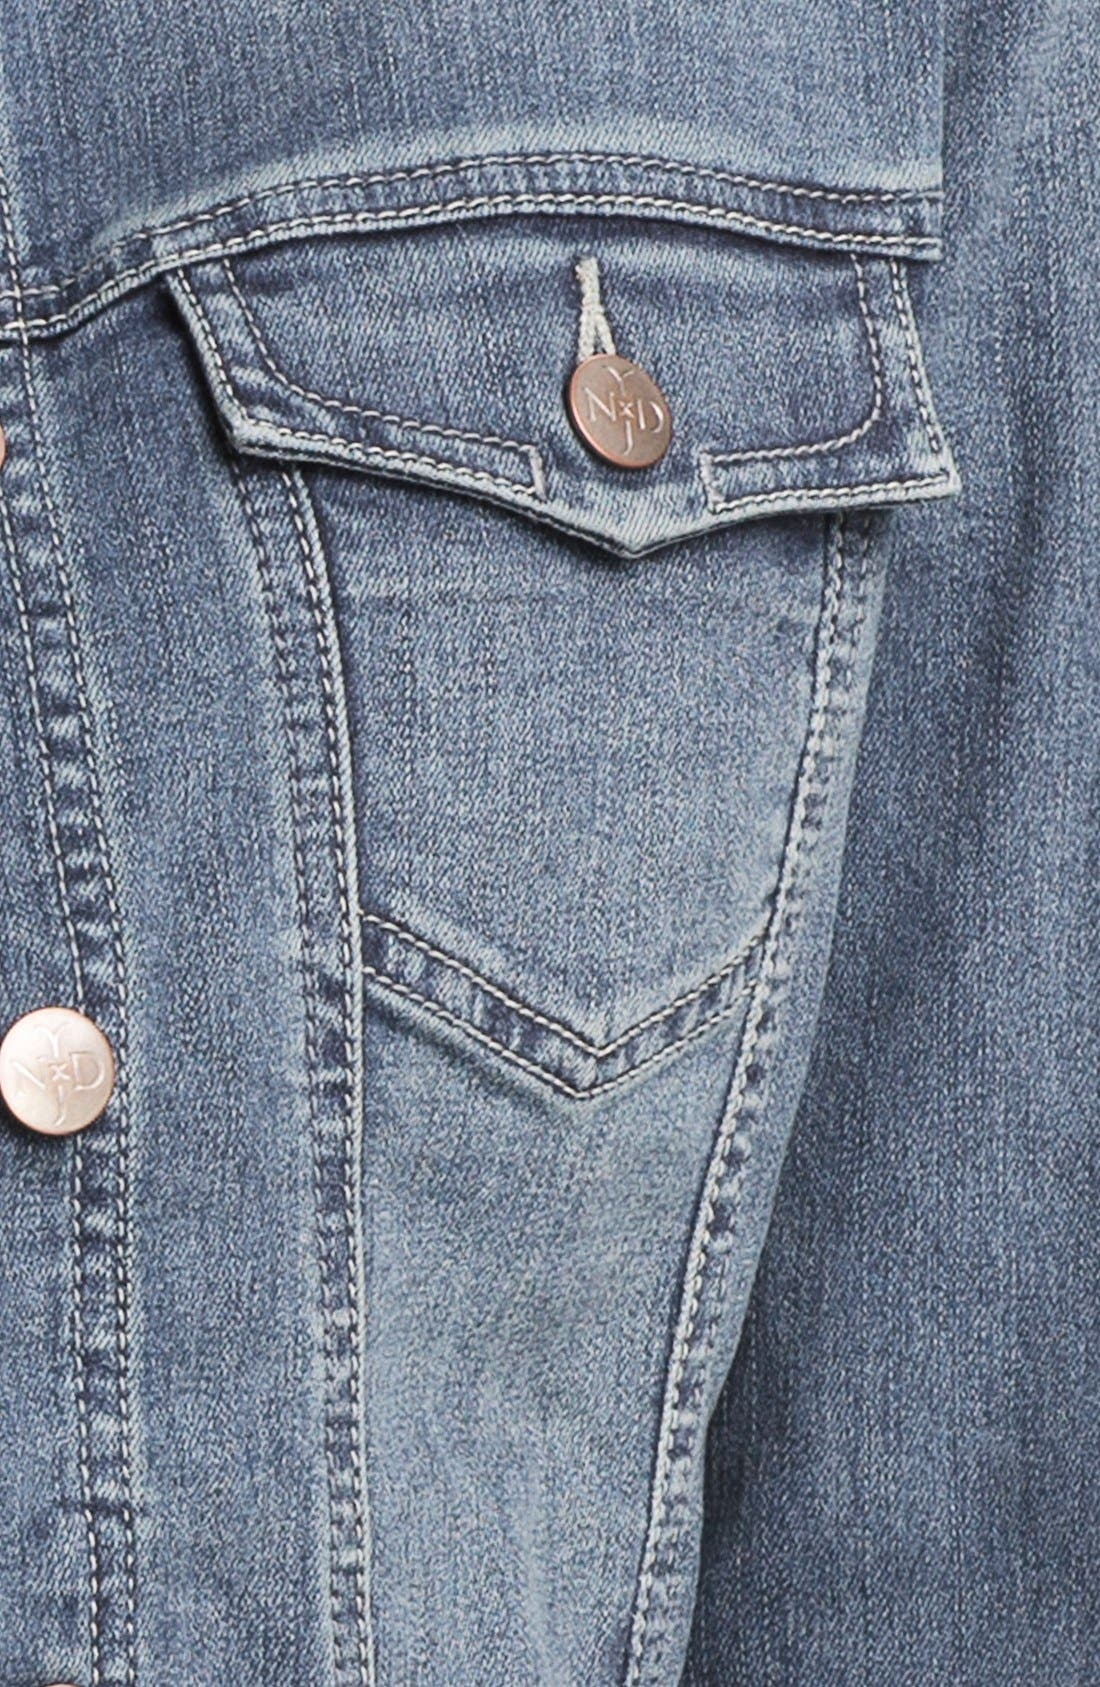 Alternate Image 3  - NYDJ 'Penny' Denim Jacket